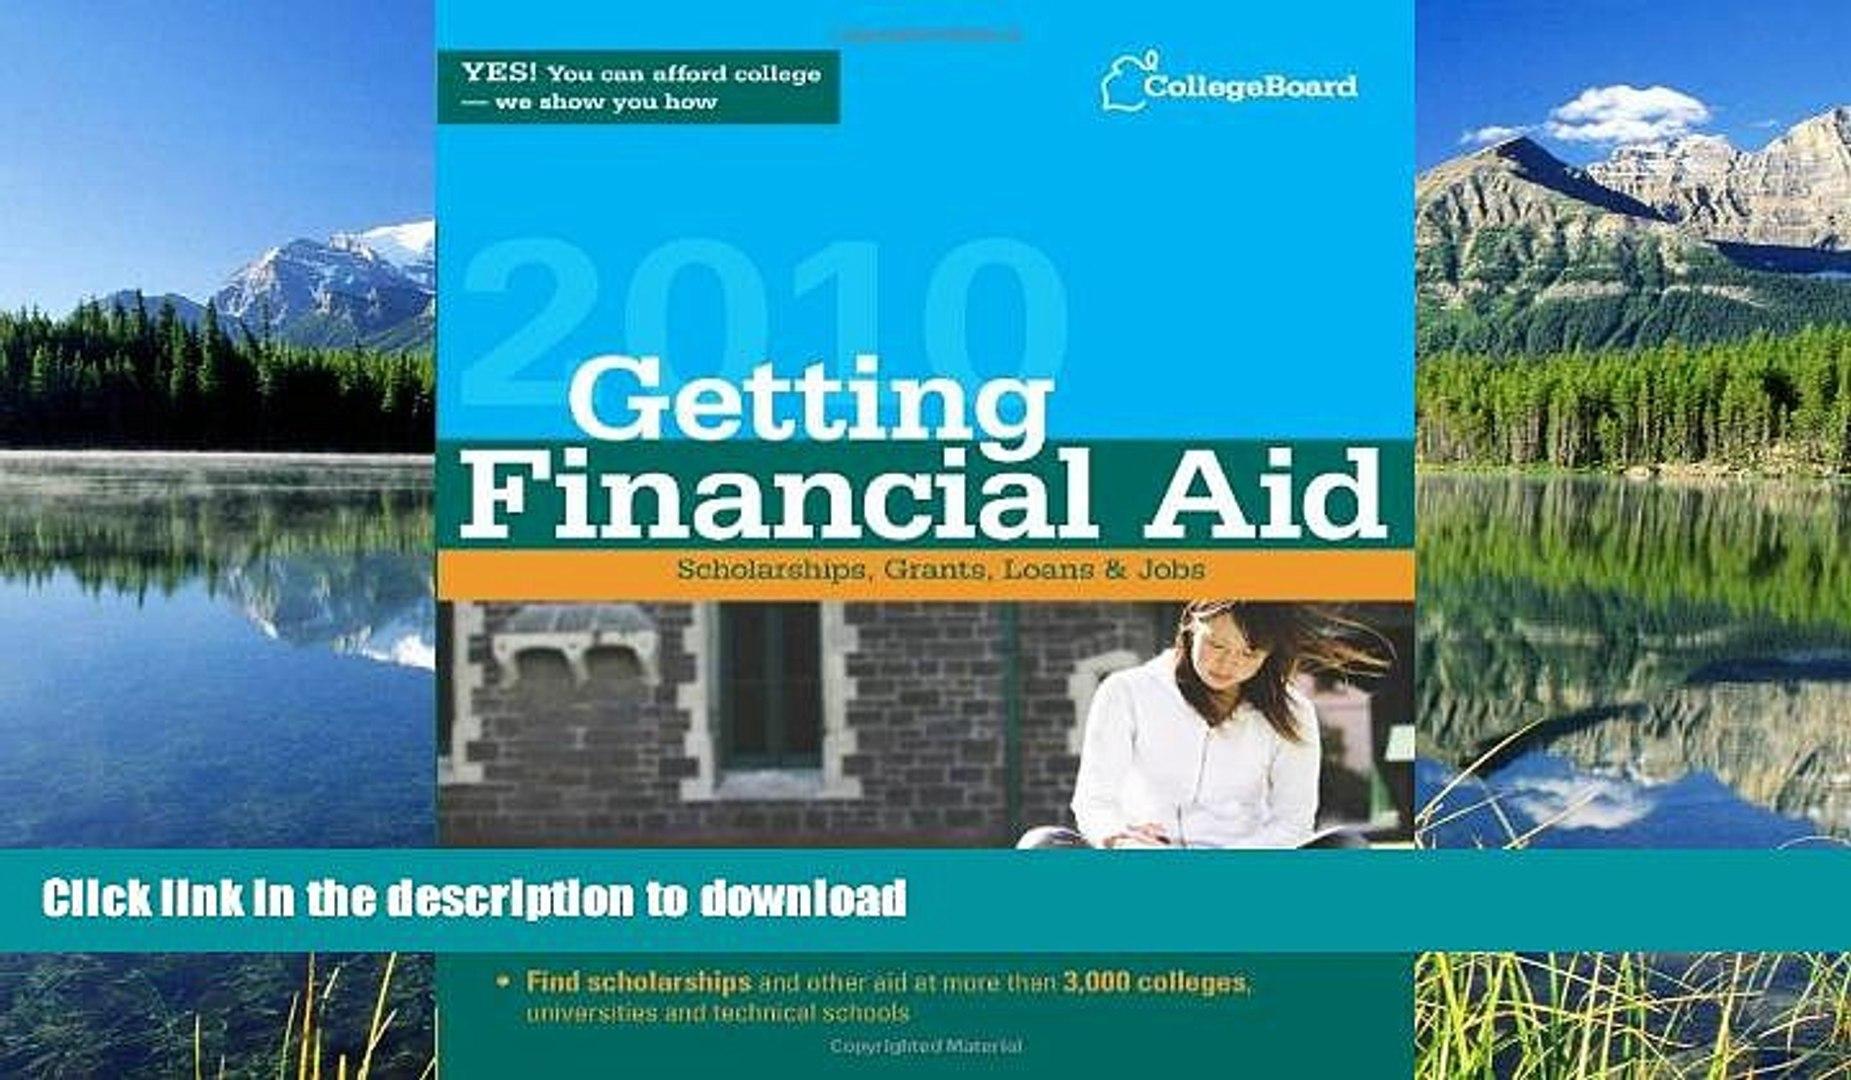 READ Getting Financial Aid 2010 (College Board Guide to Getting Financial Aid) The College Board